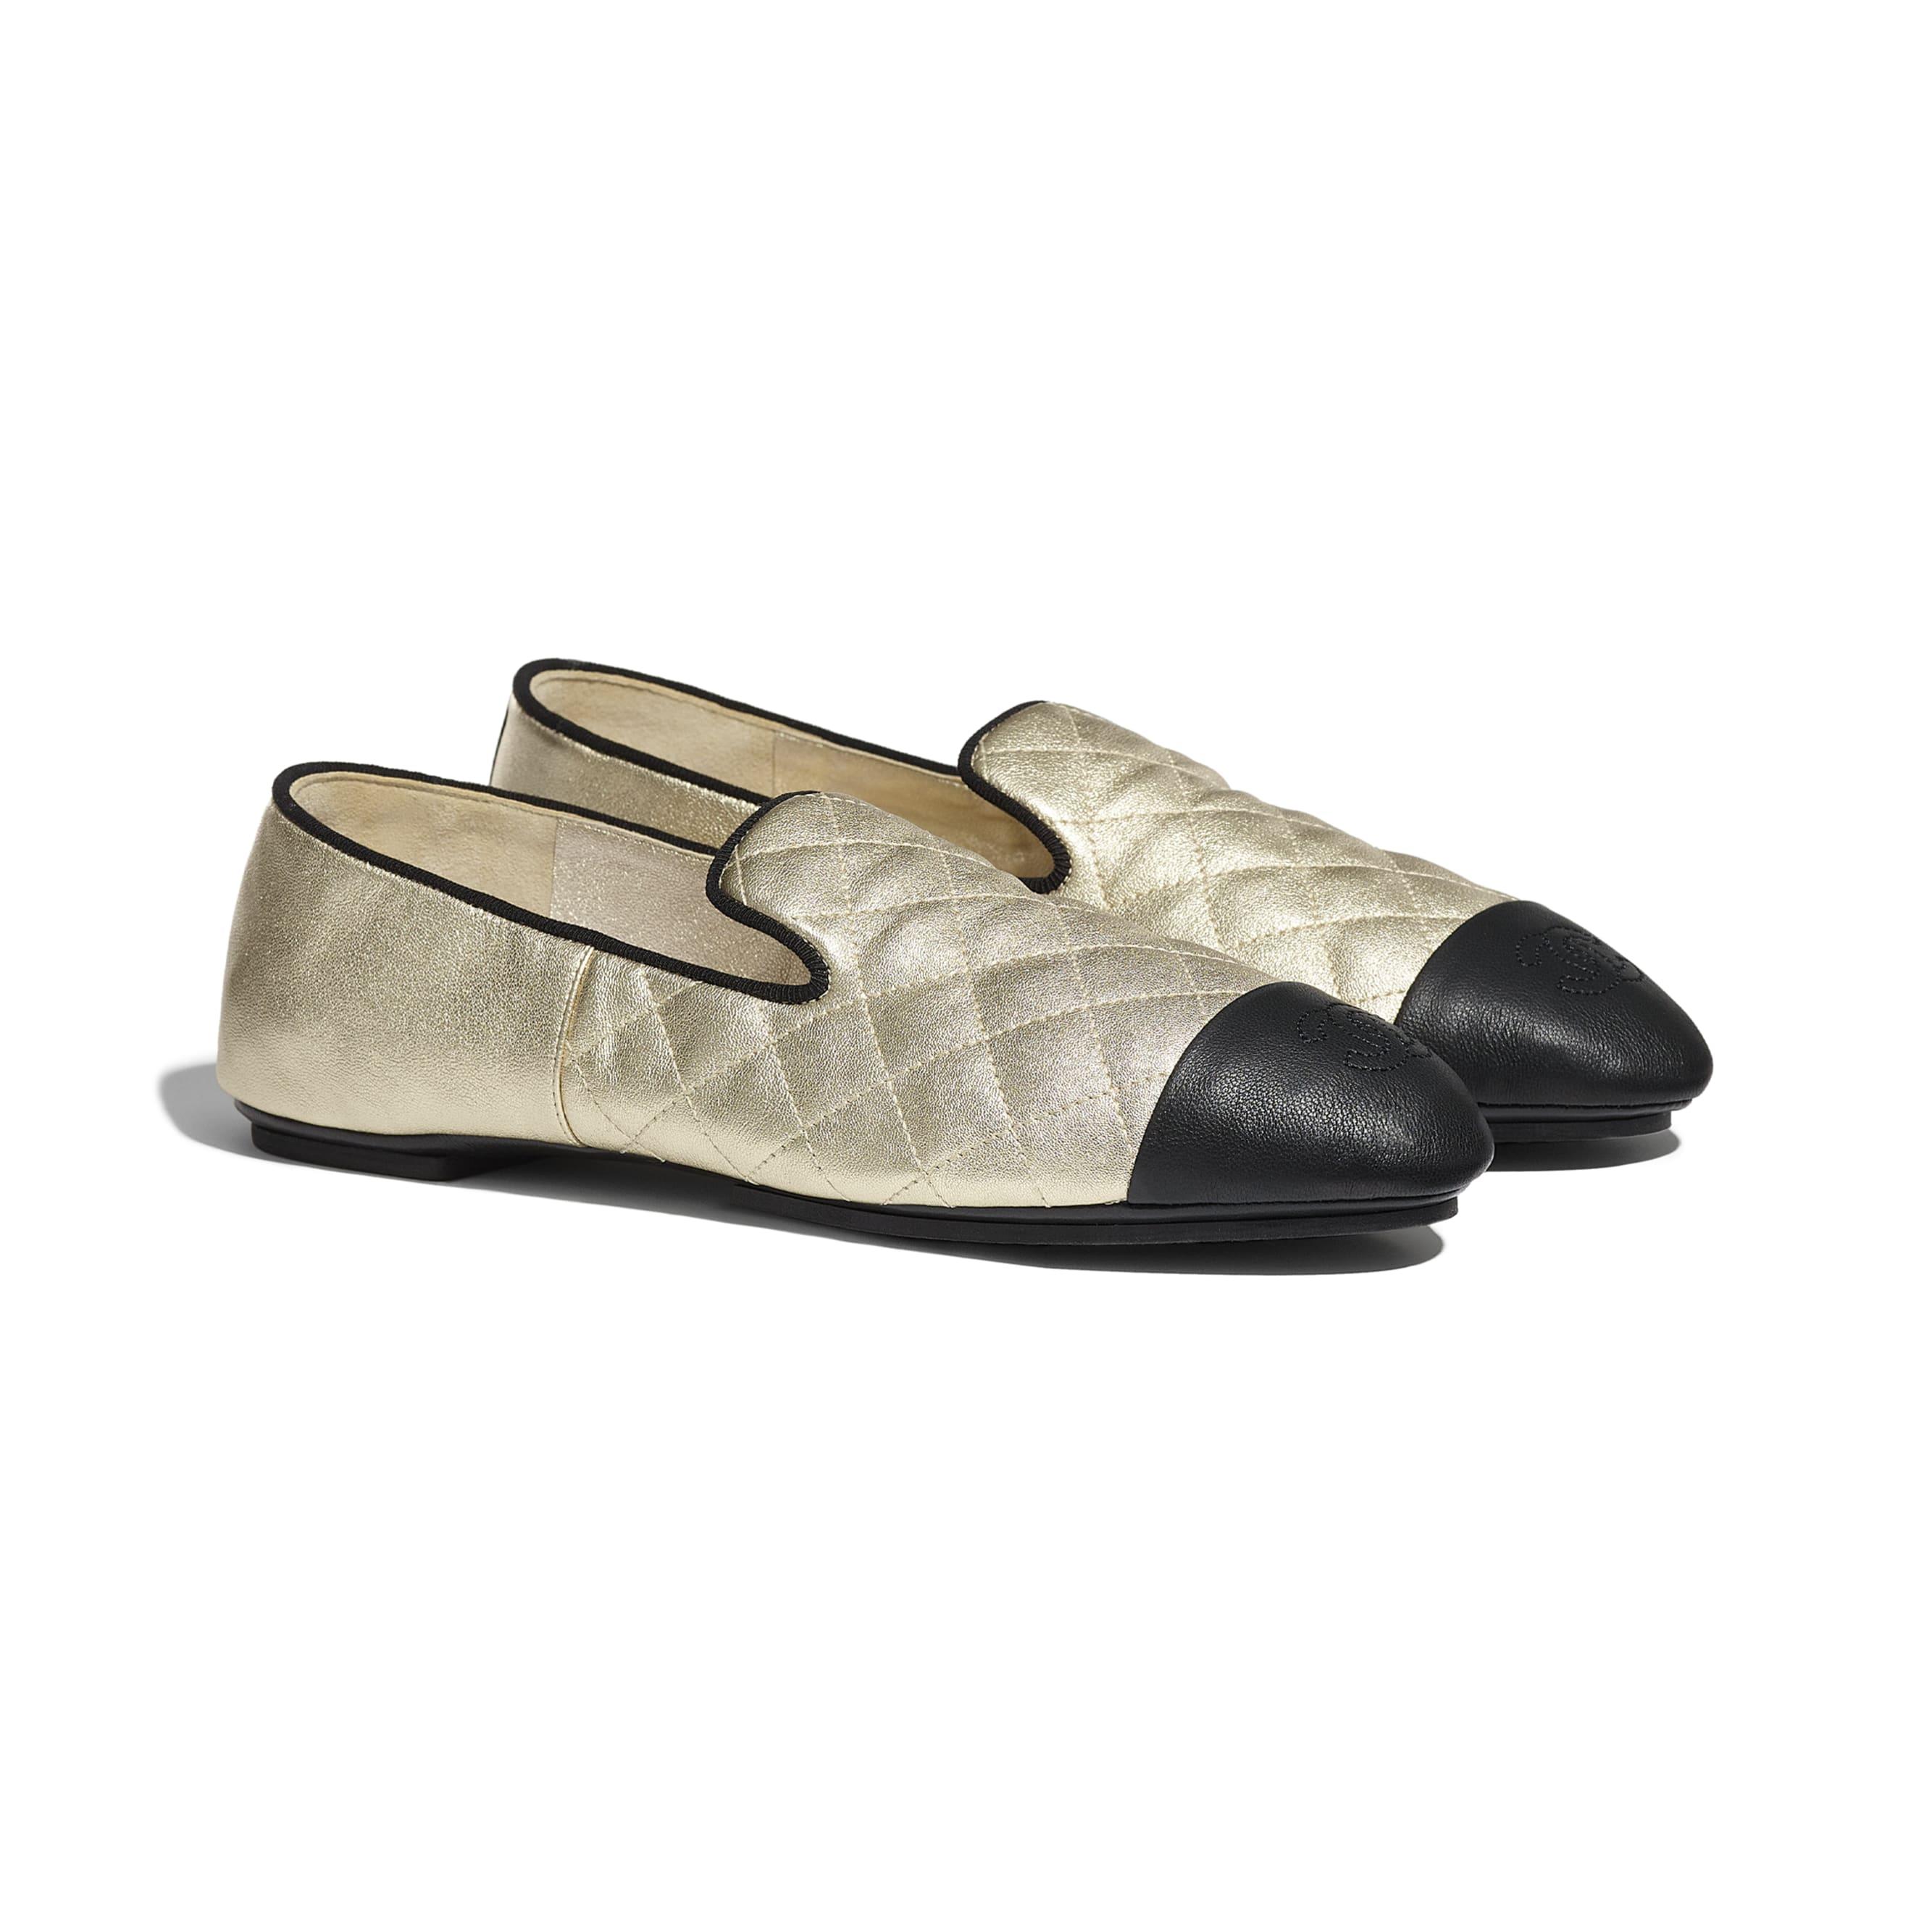 Loafers - Gold & Black - Laminated Lambskin & Lambskin - CHANEL - Alternative view - see standard sized version